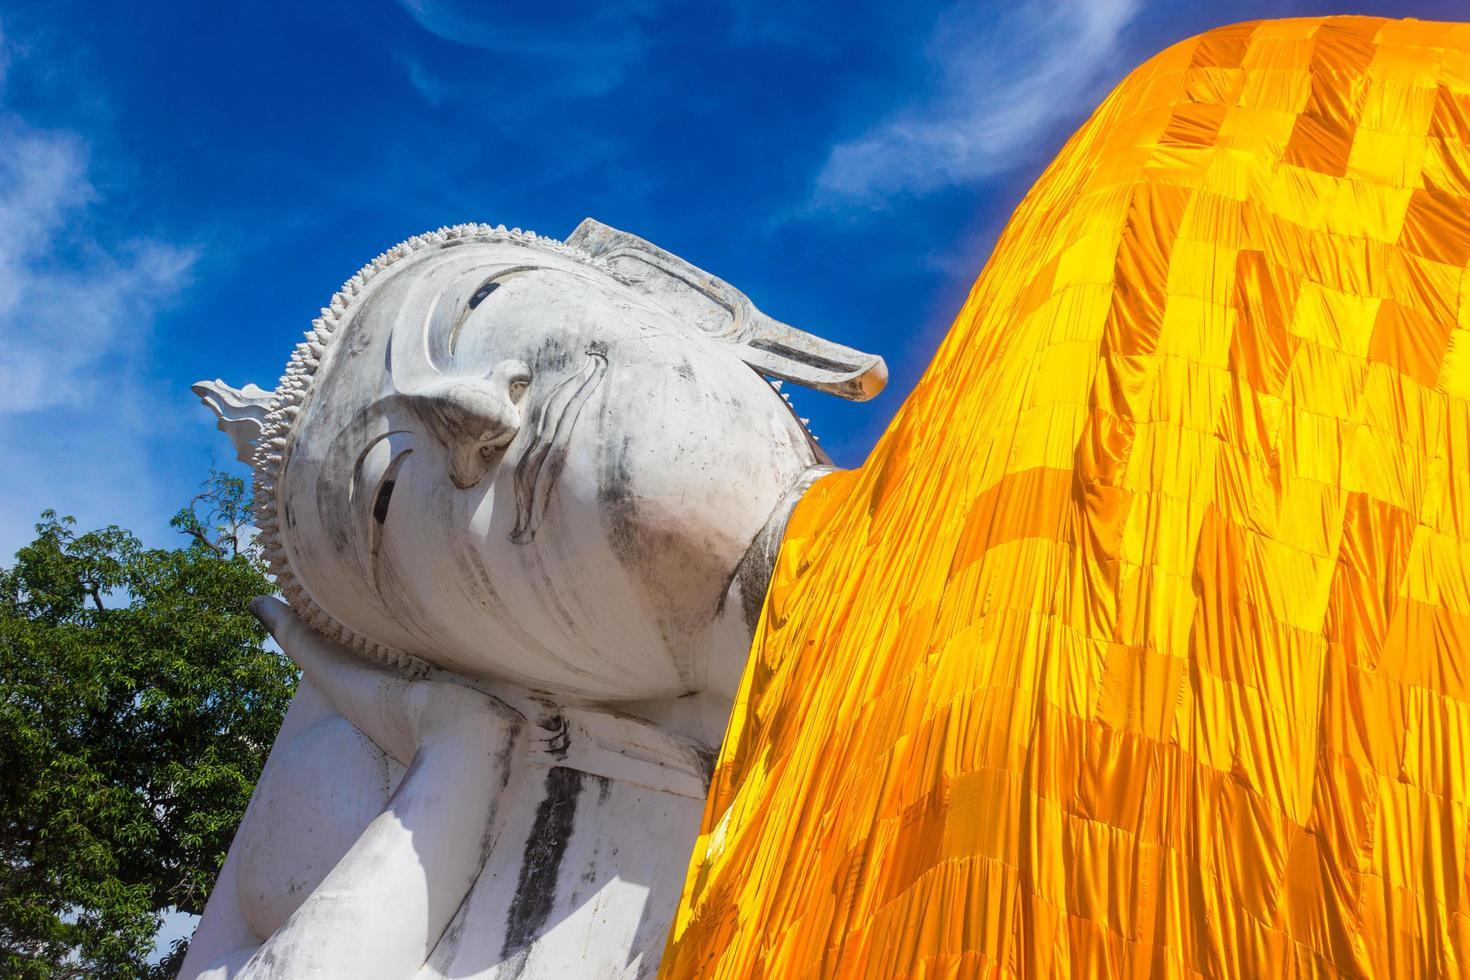 Bangkok, Thailand, 2020 - liegende Buddha-Statue foto